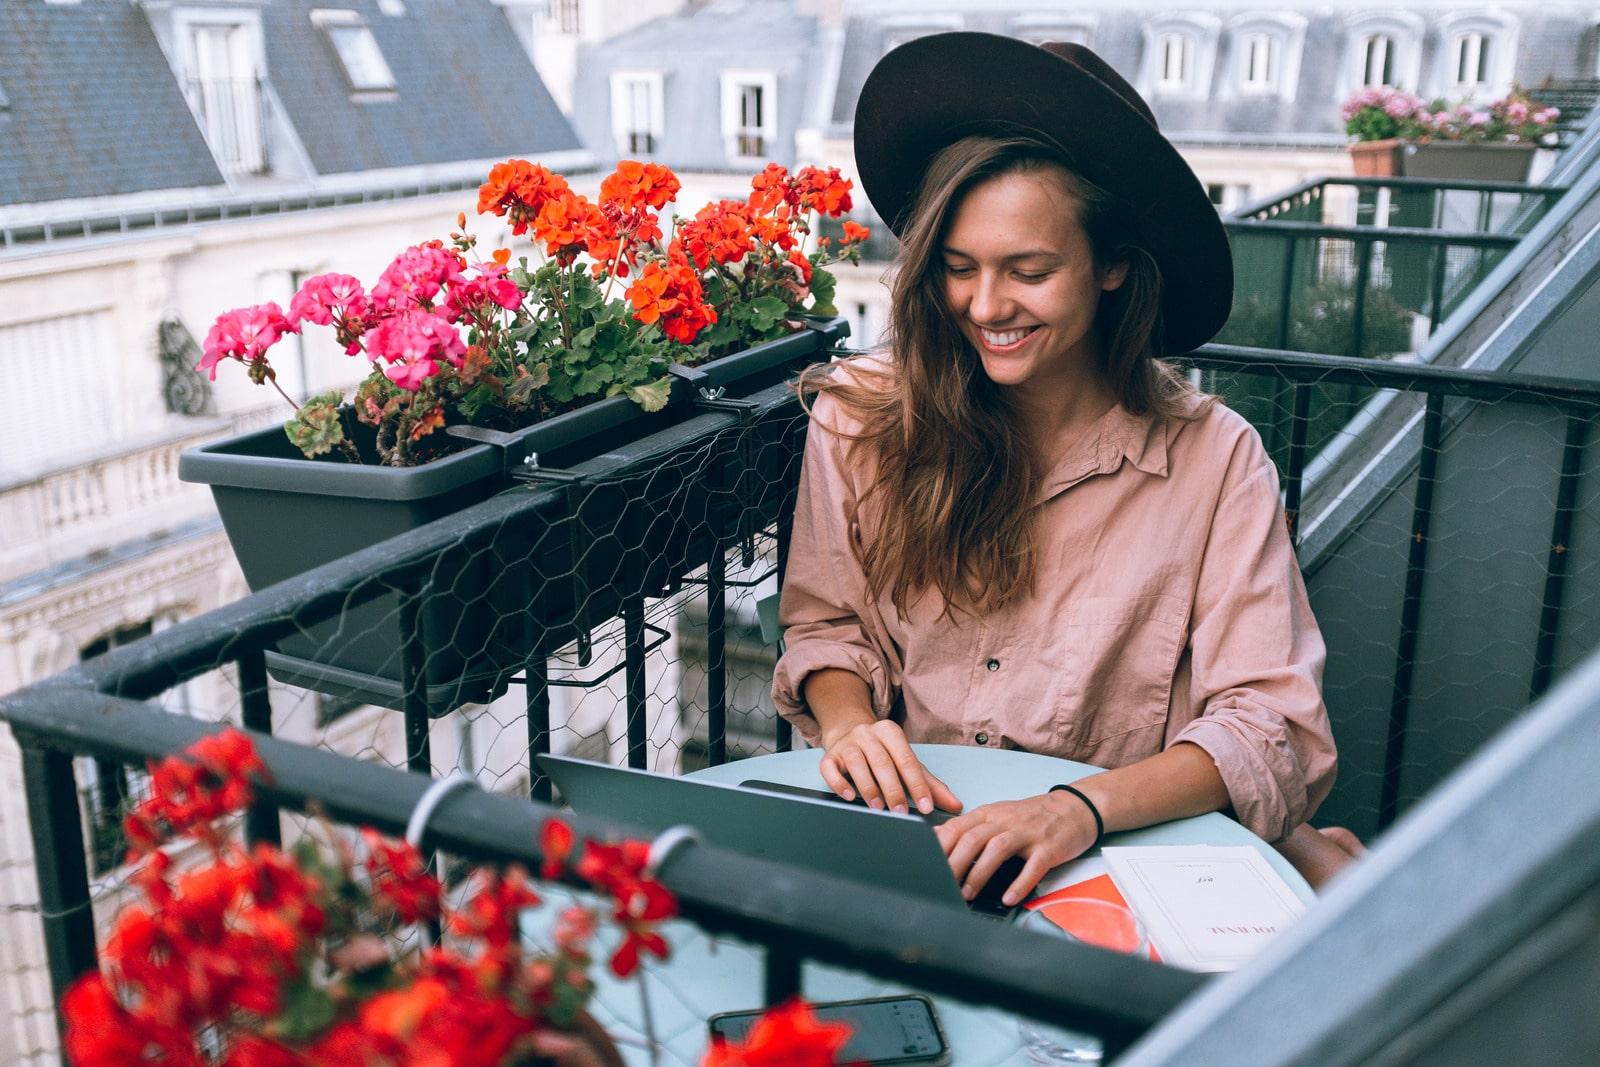 Foto von Daria Shevtsova: https://www.canva.com/photos/MADyQx--2RY-woman-wearing-beige-dress-shirt-using-laptop-computer/